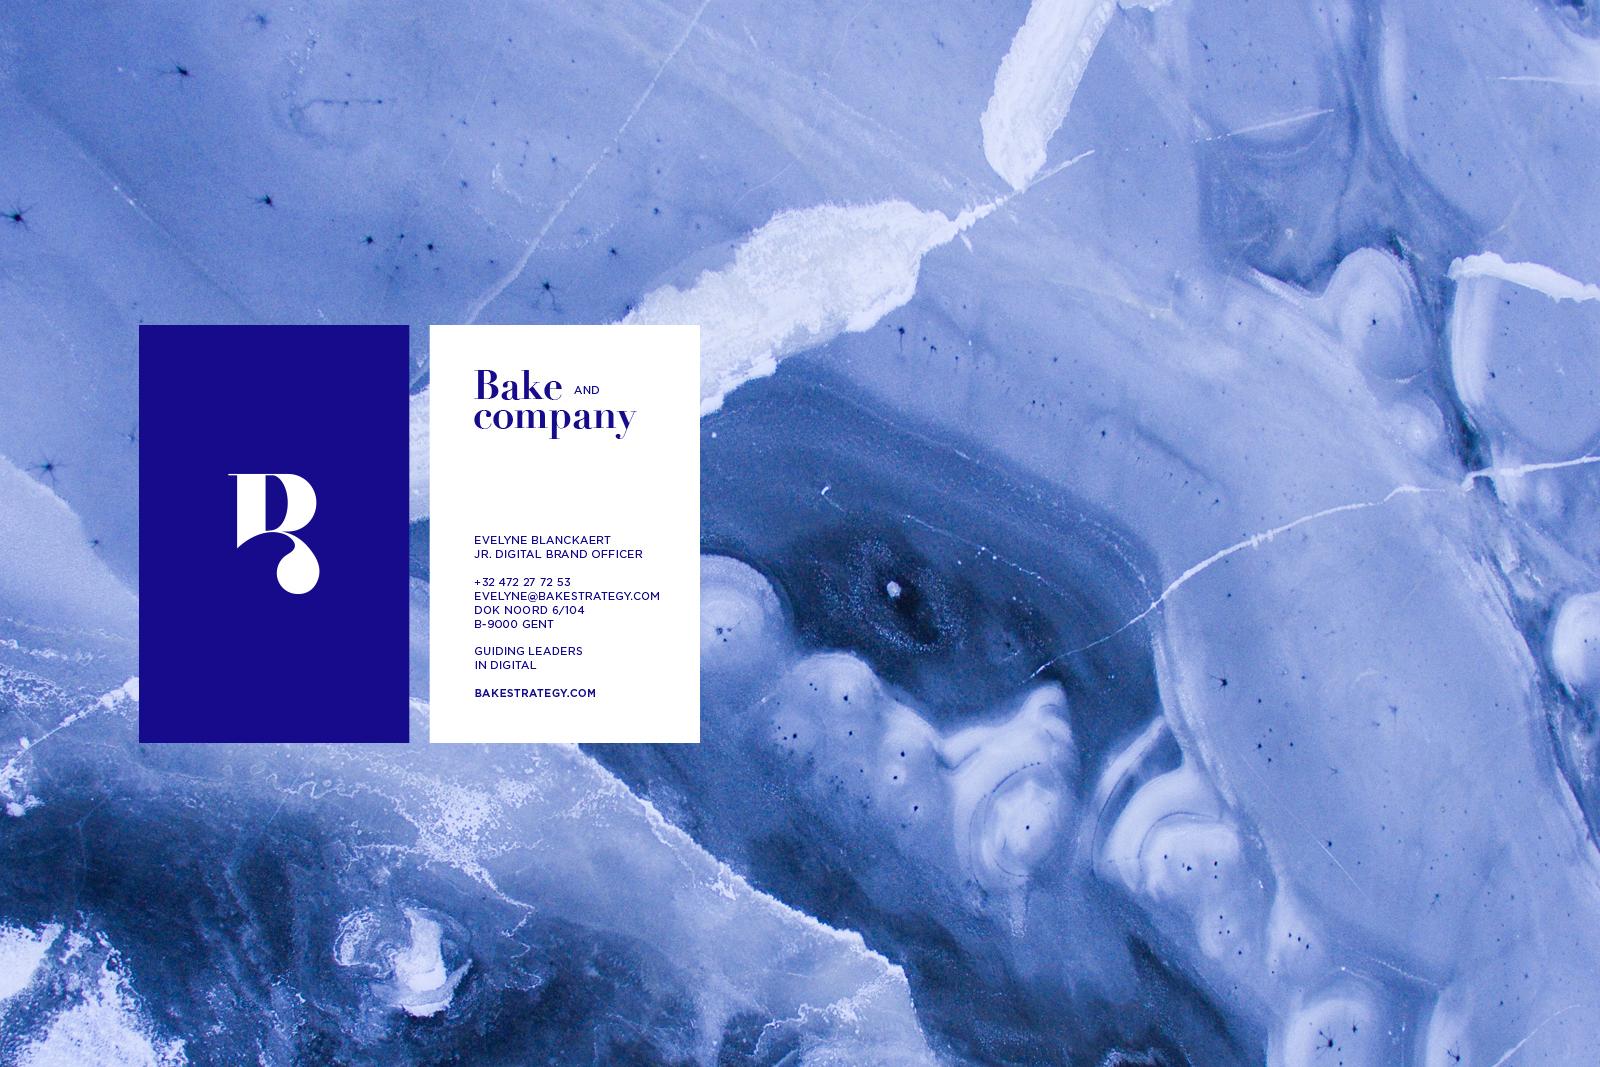 Bake 6